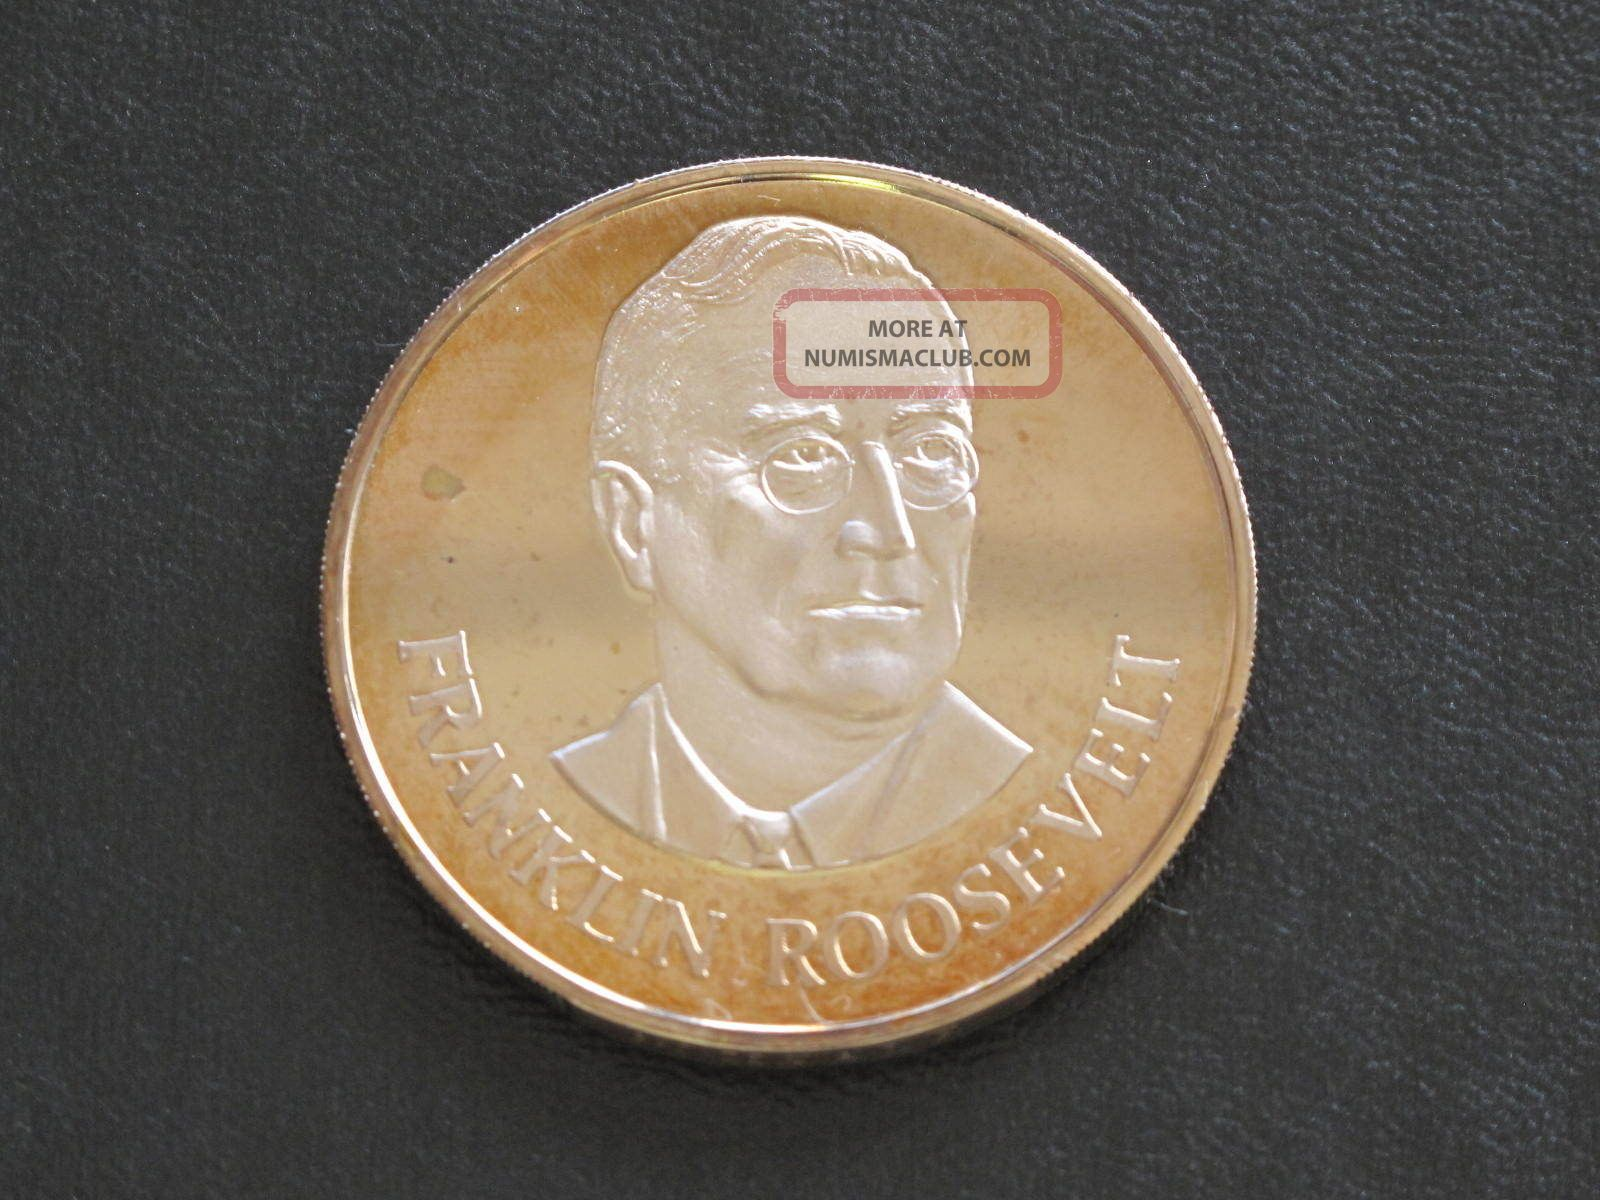 Franklin Roosevelt Proof - Quality Solid Bronze Medal Danbury D0350 Exonumia photo